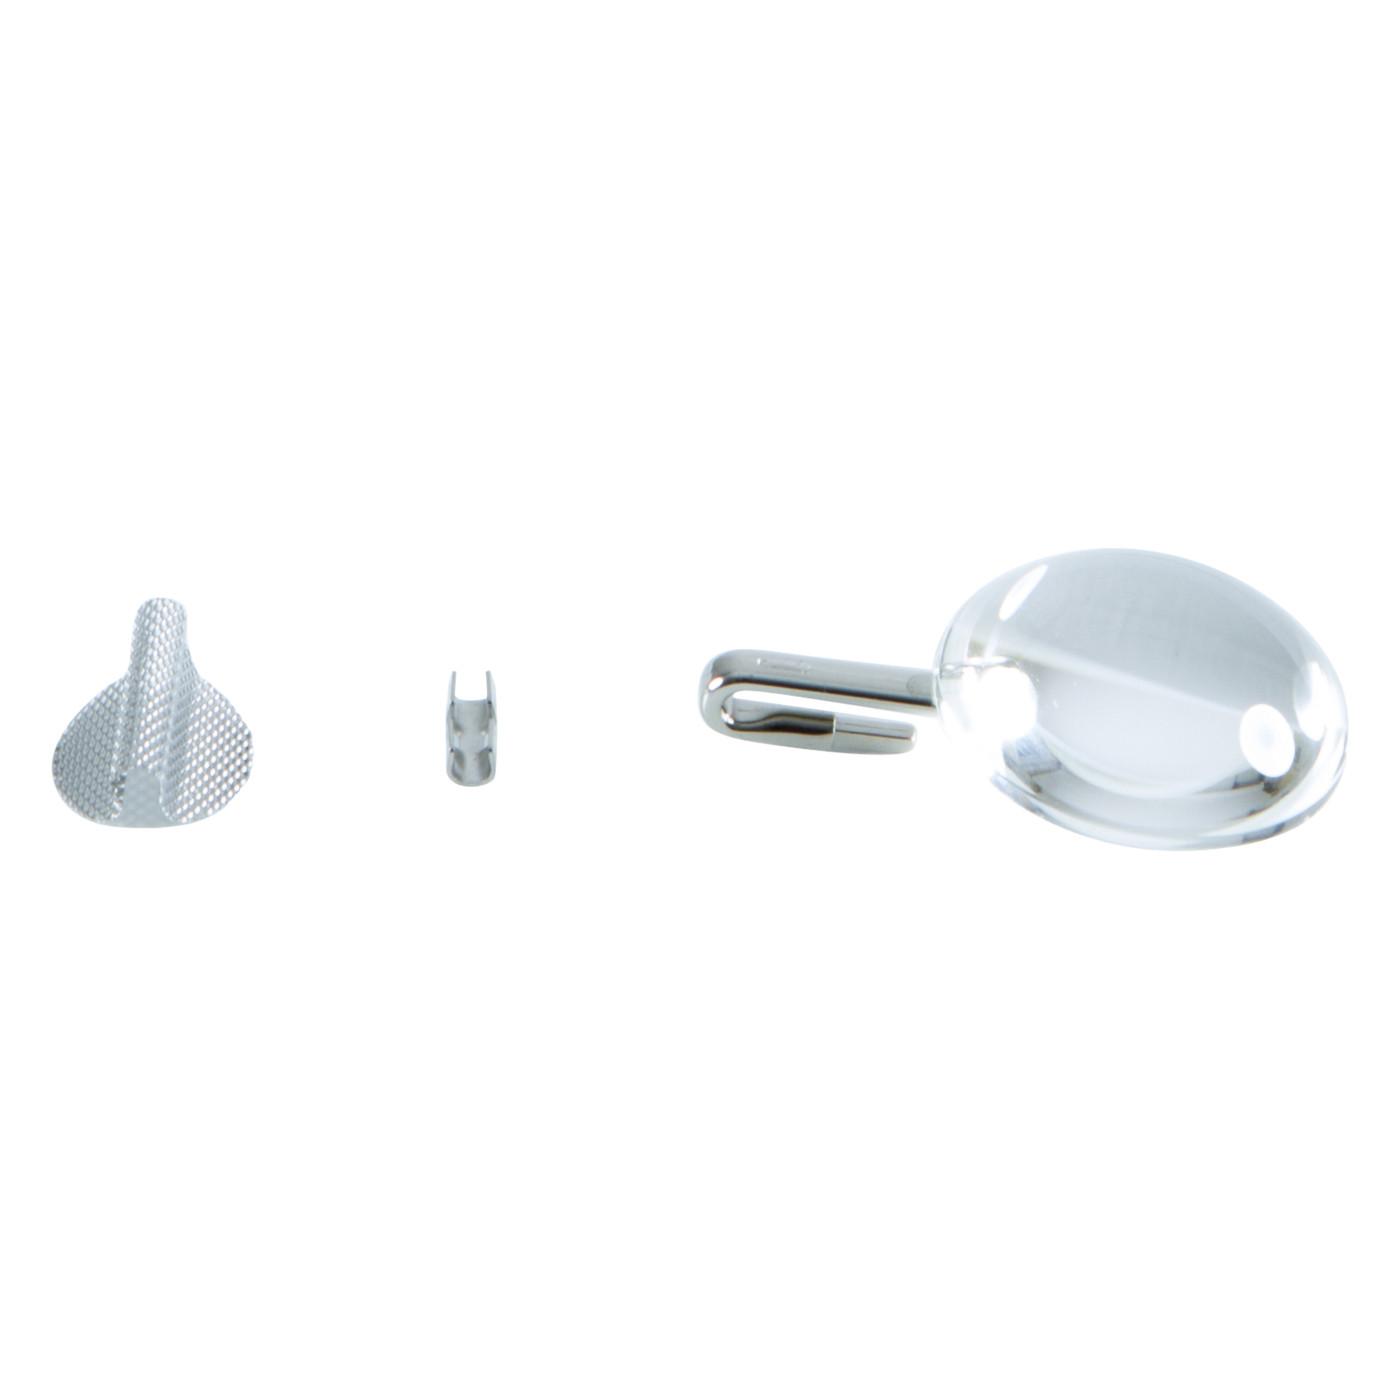 Catellani & Smith Uau or Wa Wa replacement lense